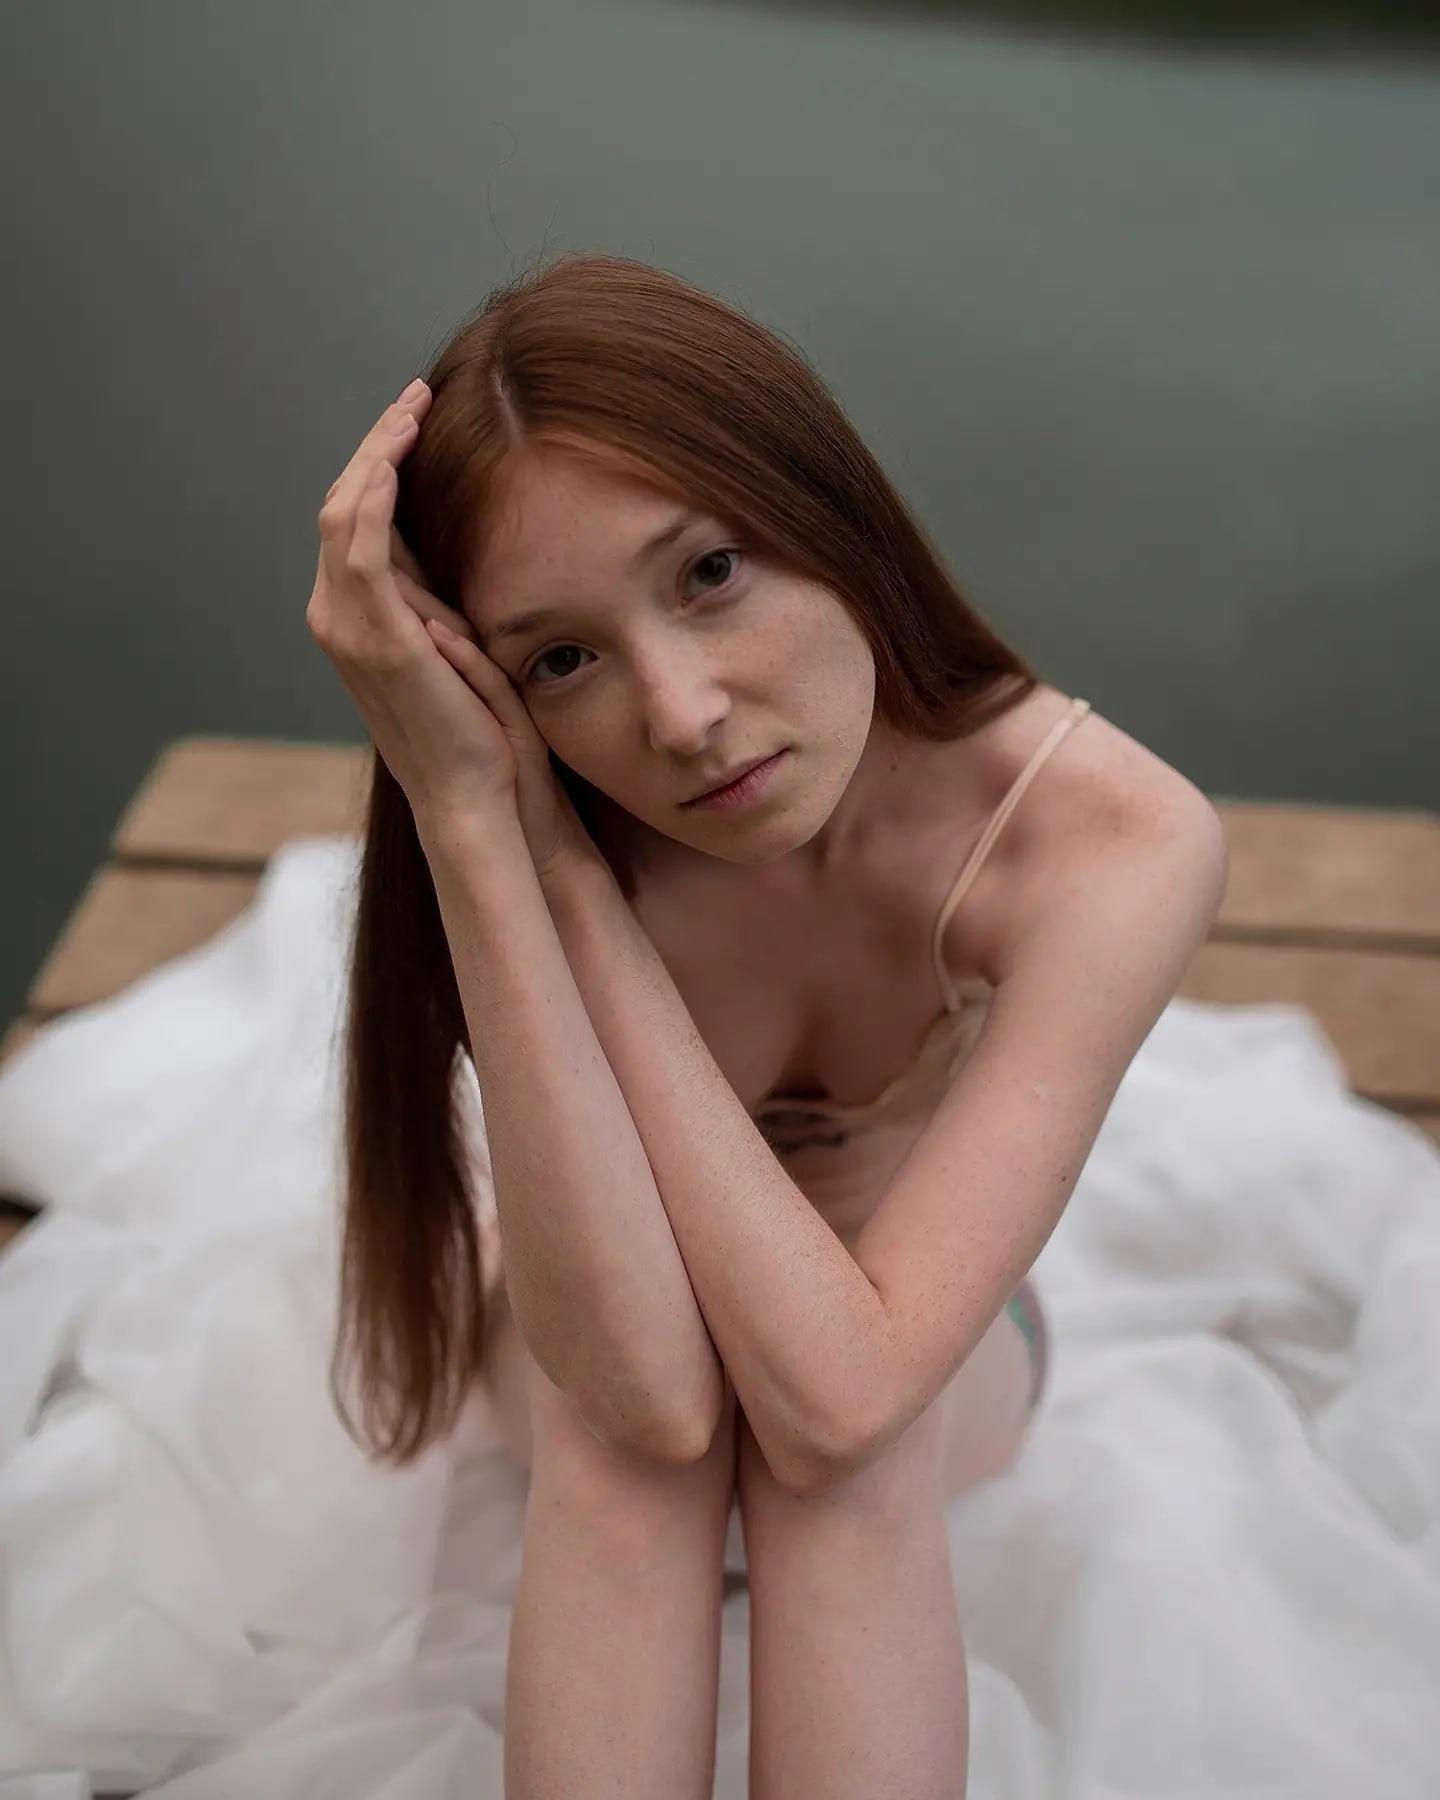 https://www.youngfolks.ru/pub/photographer-kameliya-lapina-113416